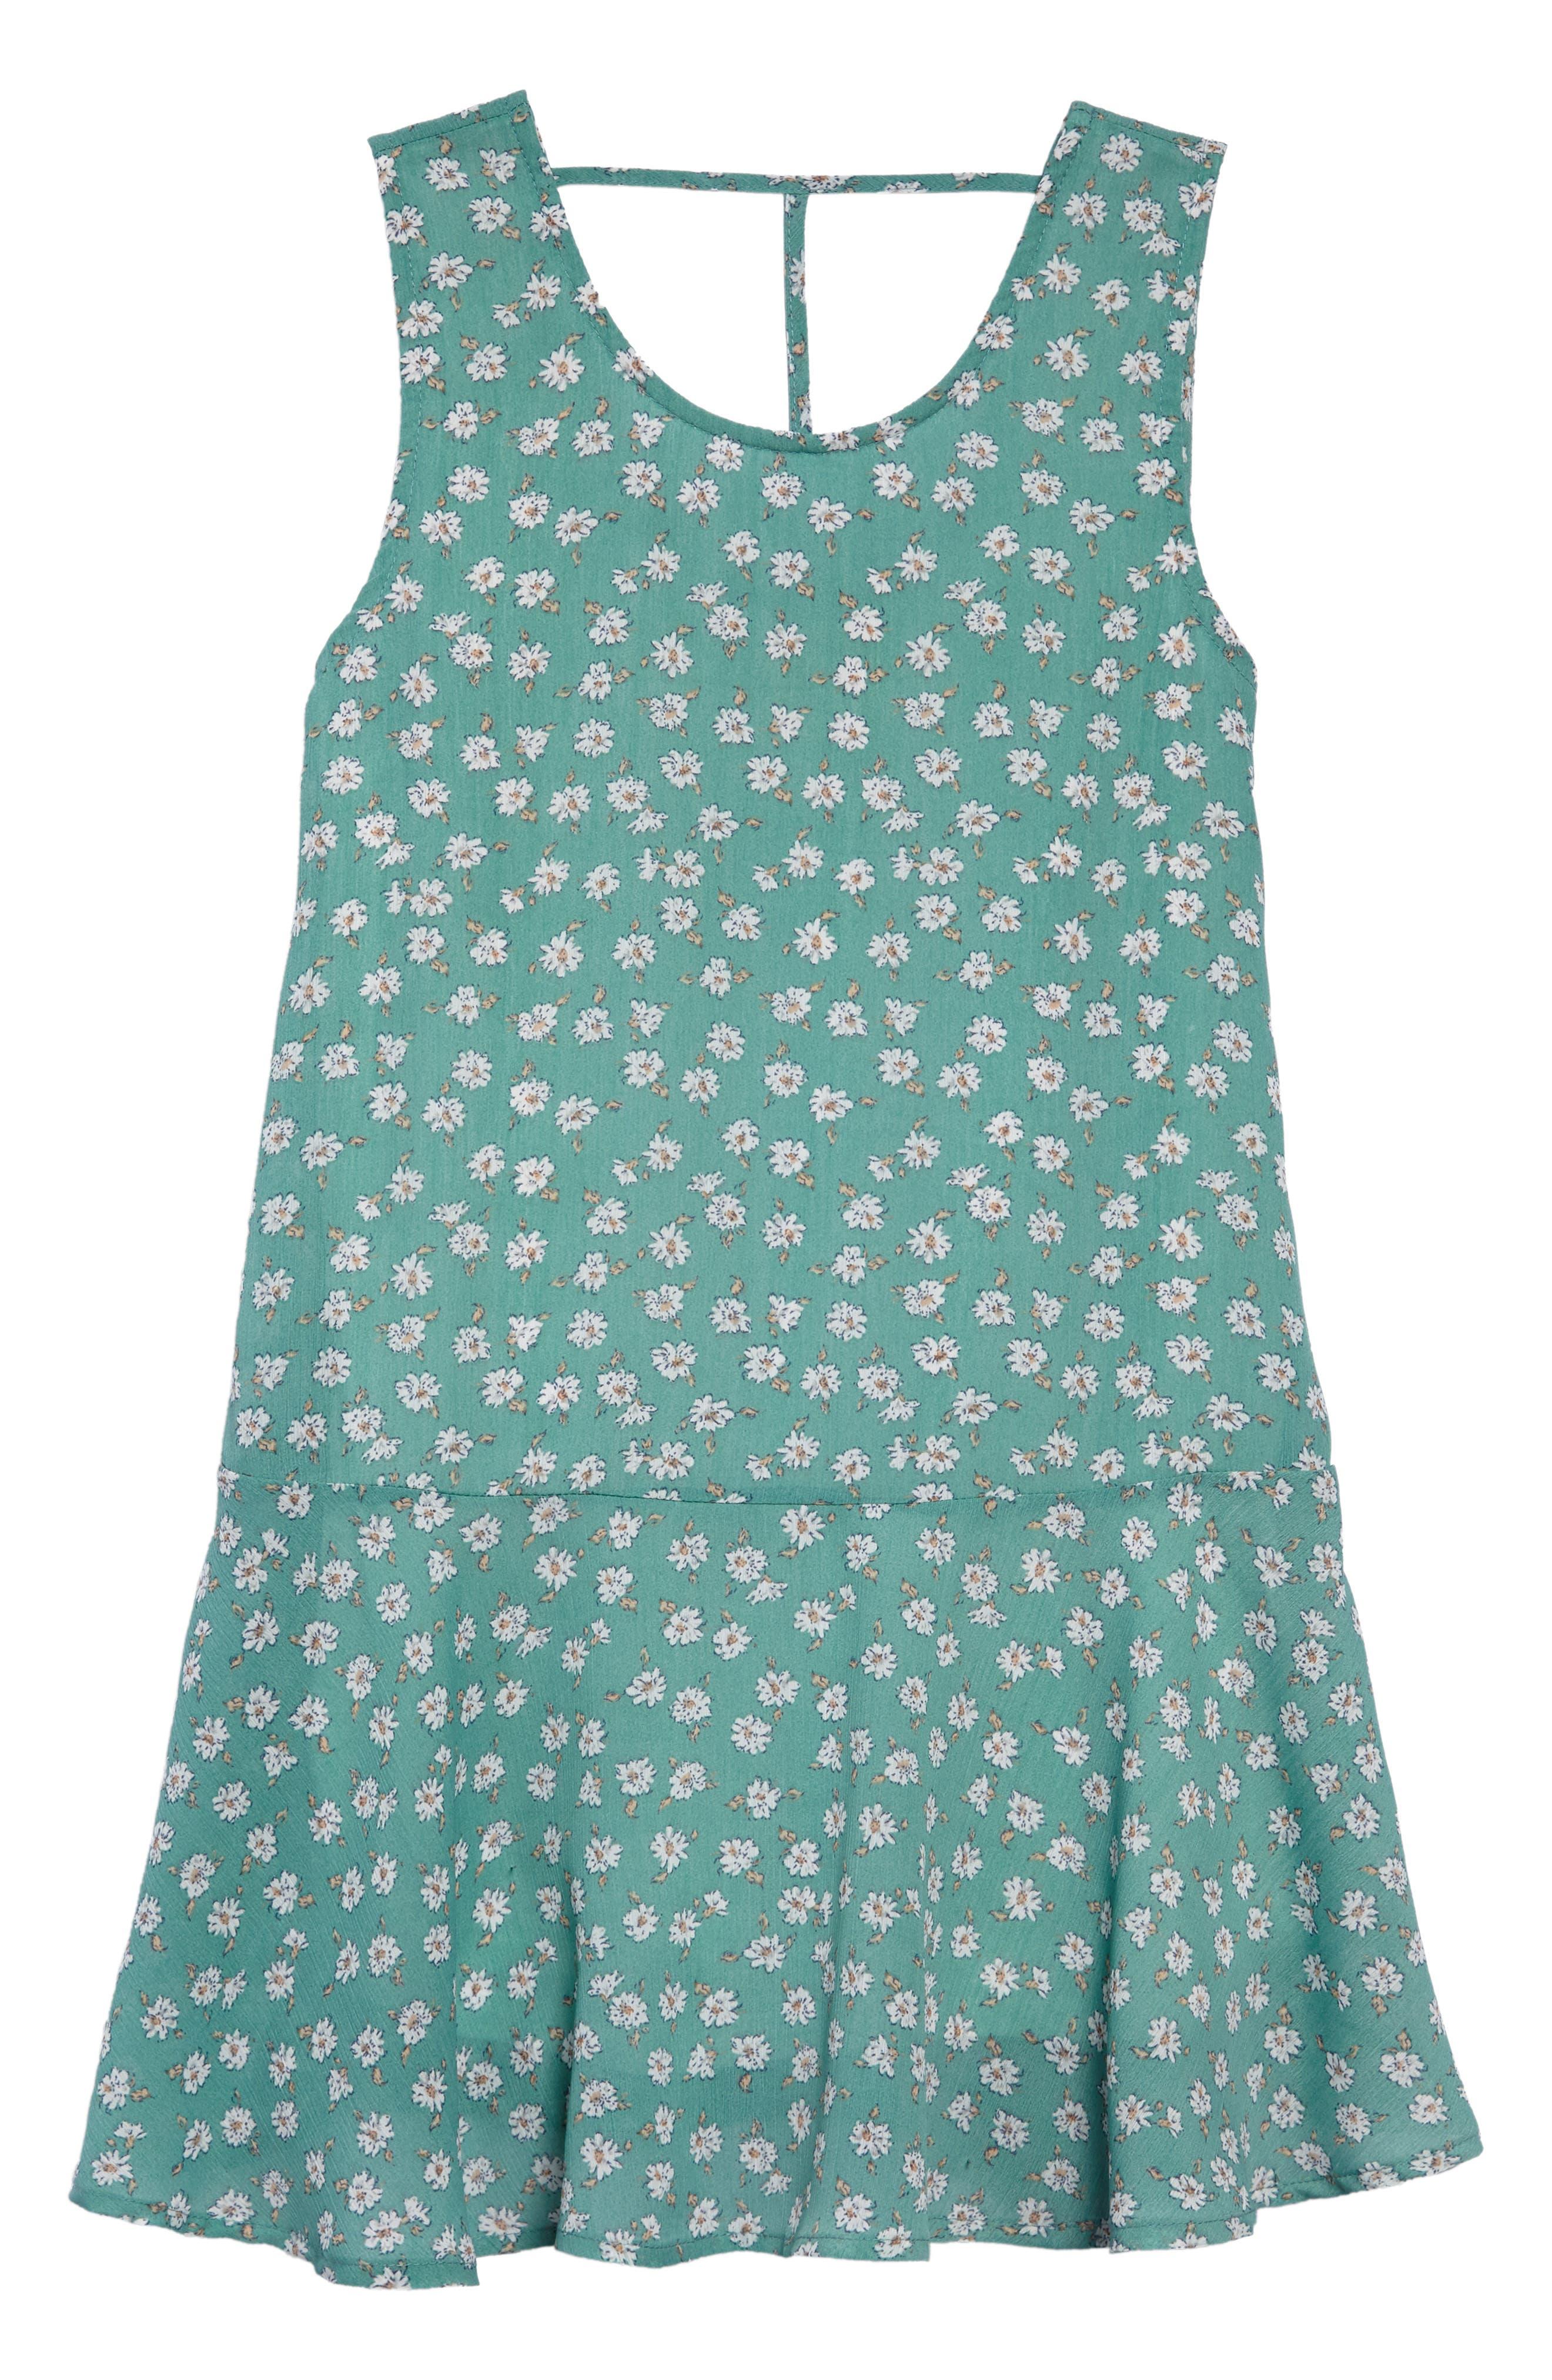 Brooklyn Floral Drop Waist Dress,                             Main thumbnail 1, color,                             330